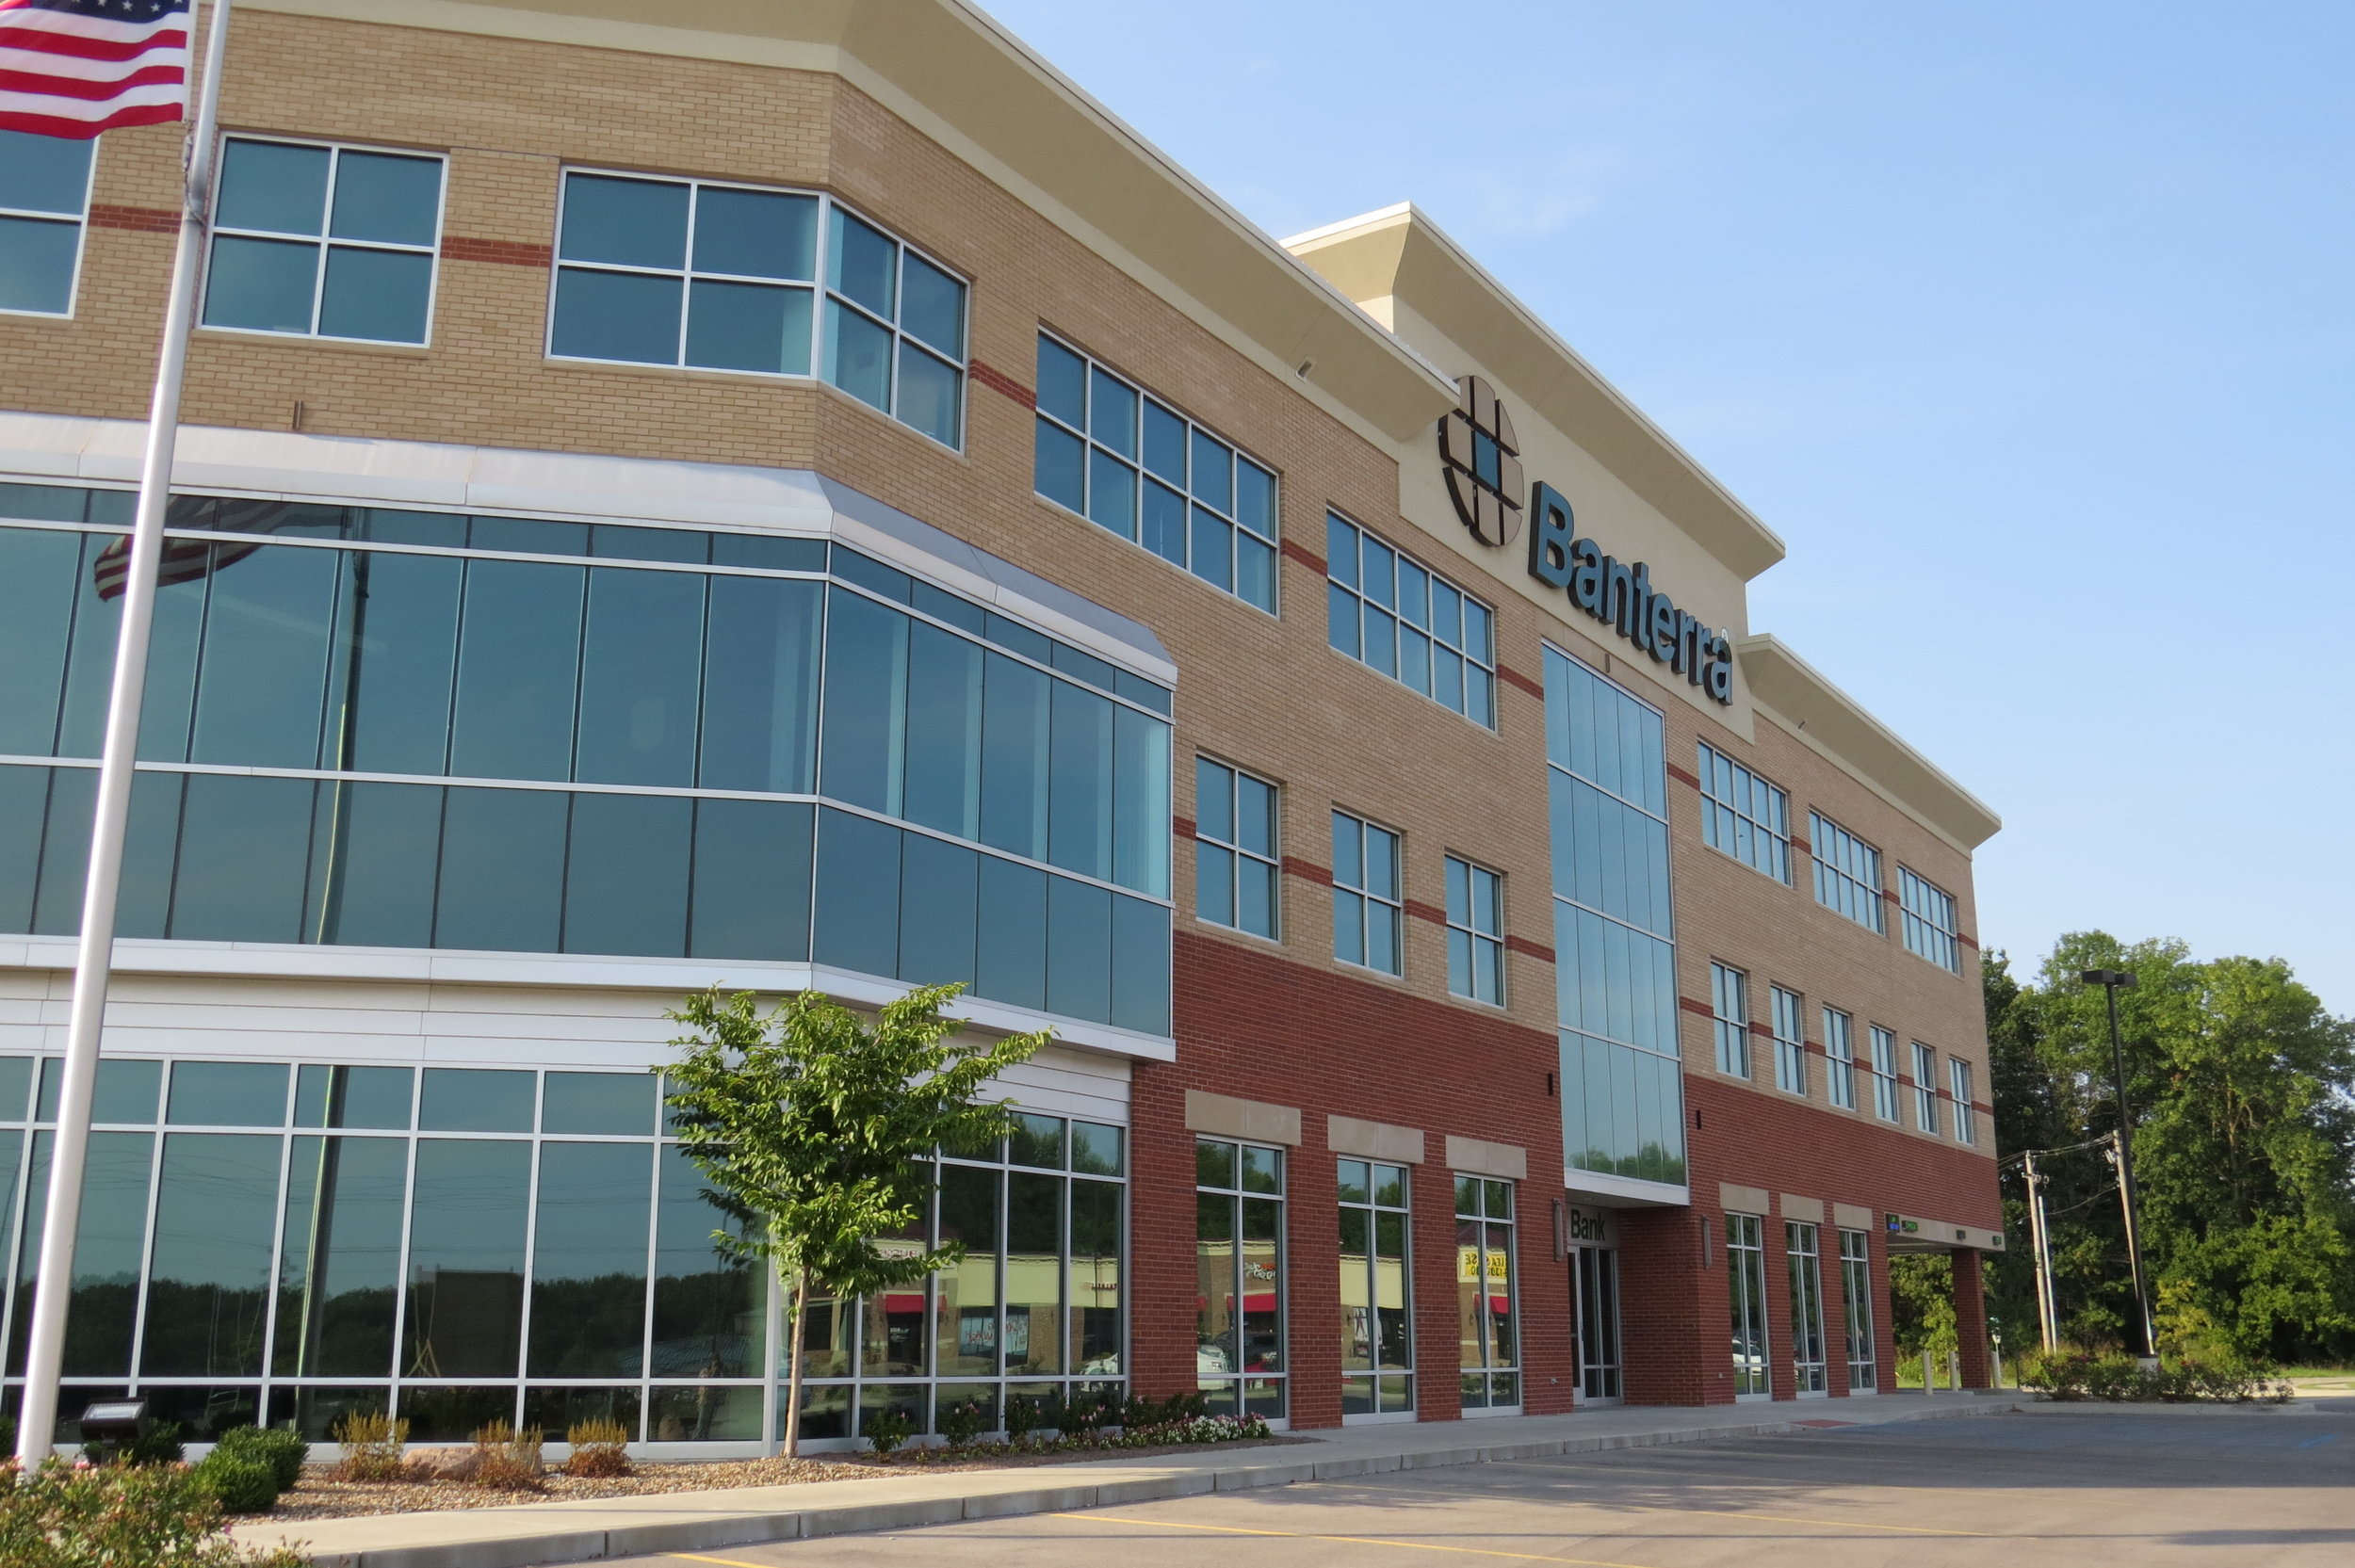 Banterra Centre - Cape Girardeau, Missouri